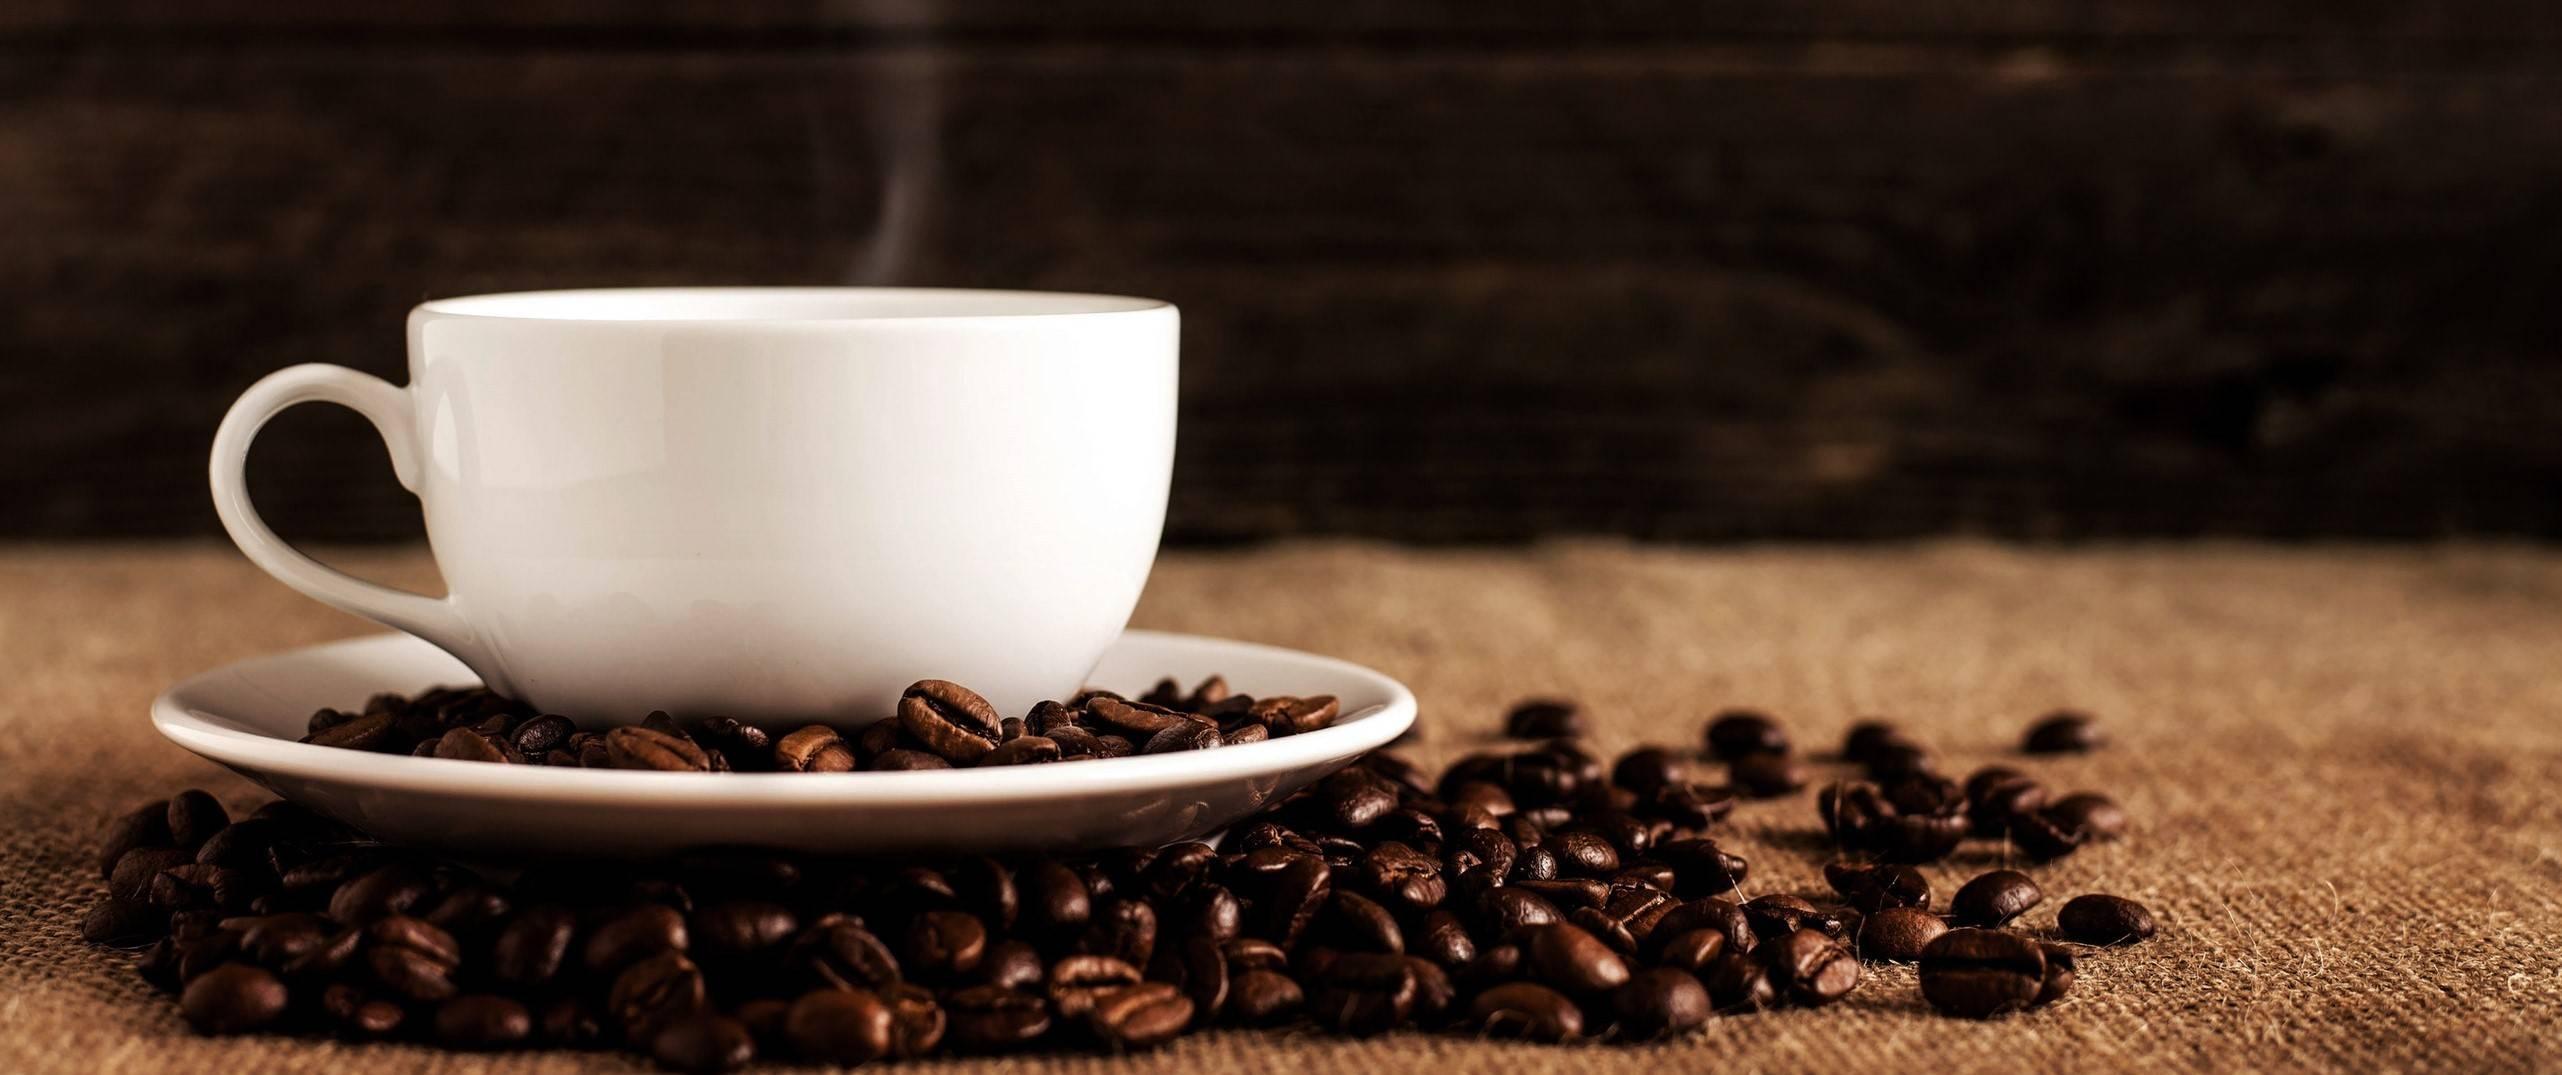 La CAFFEINA fa bene alla salute?